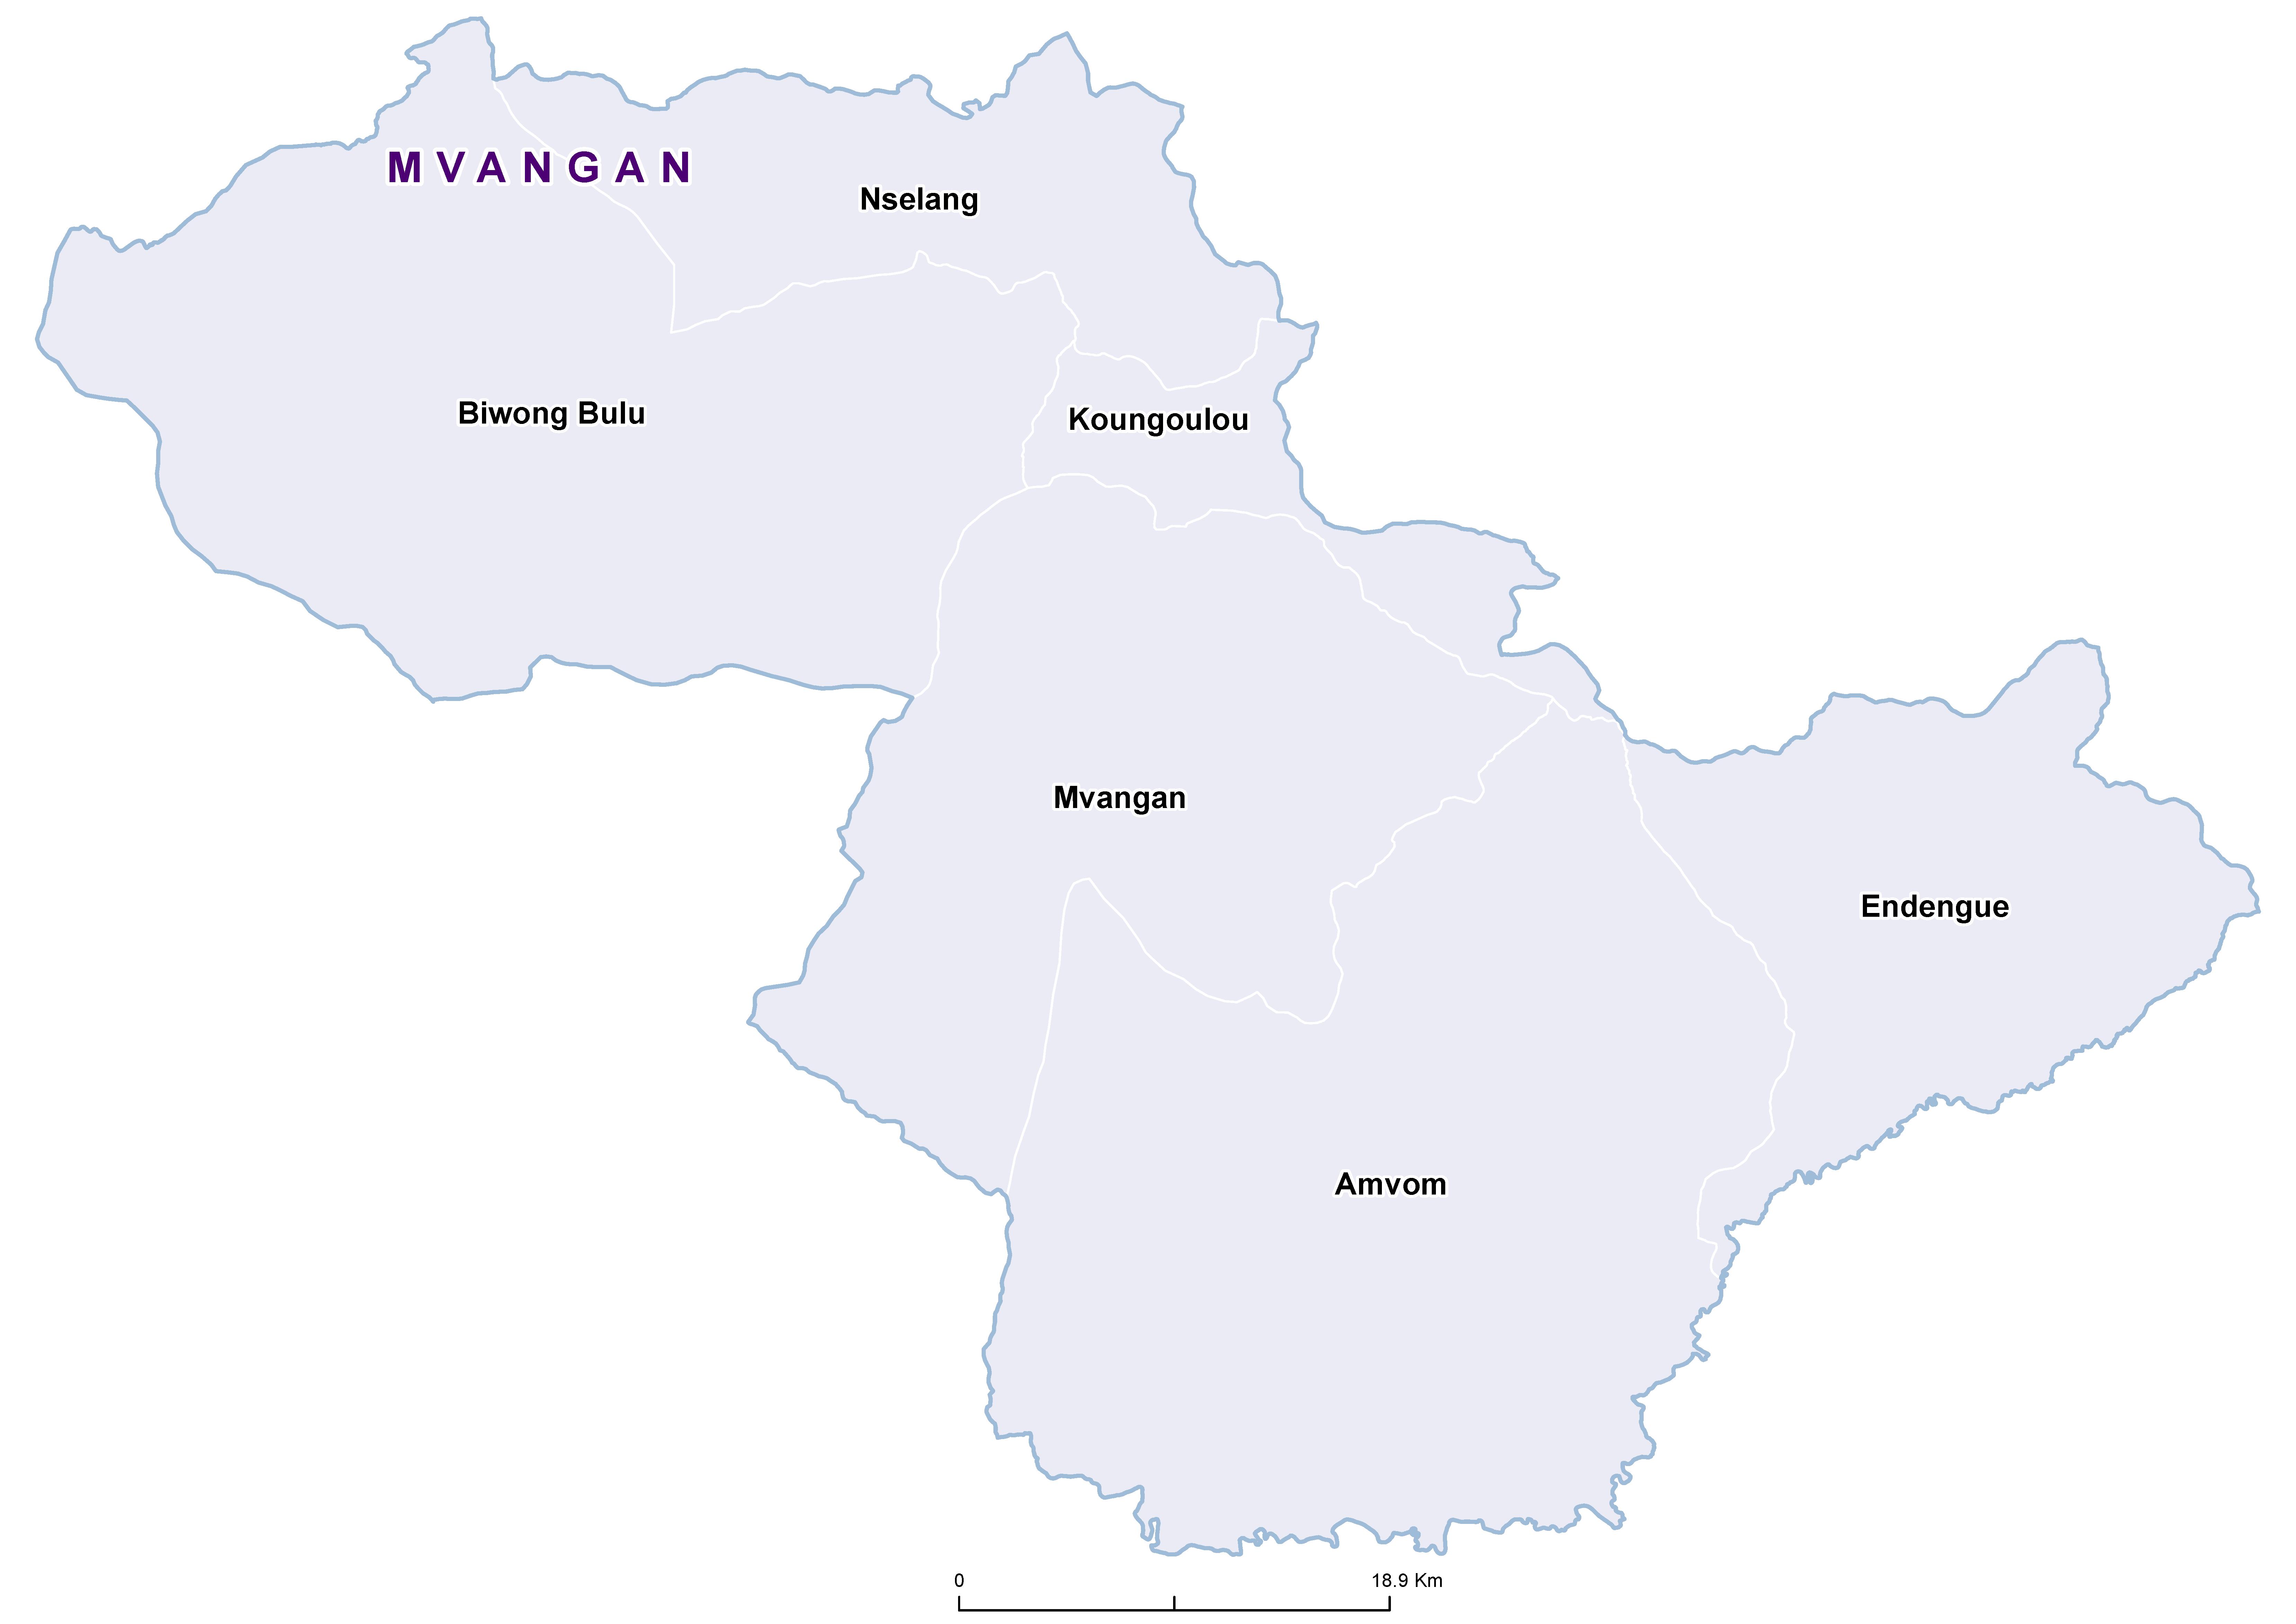 Mvangan STH 20180001